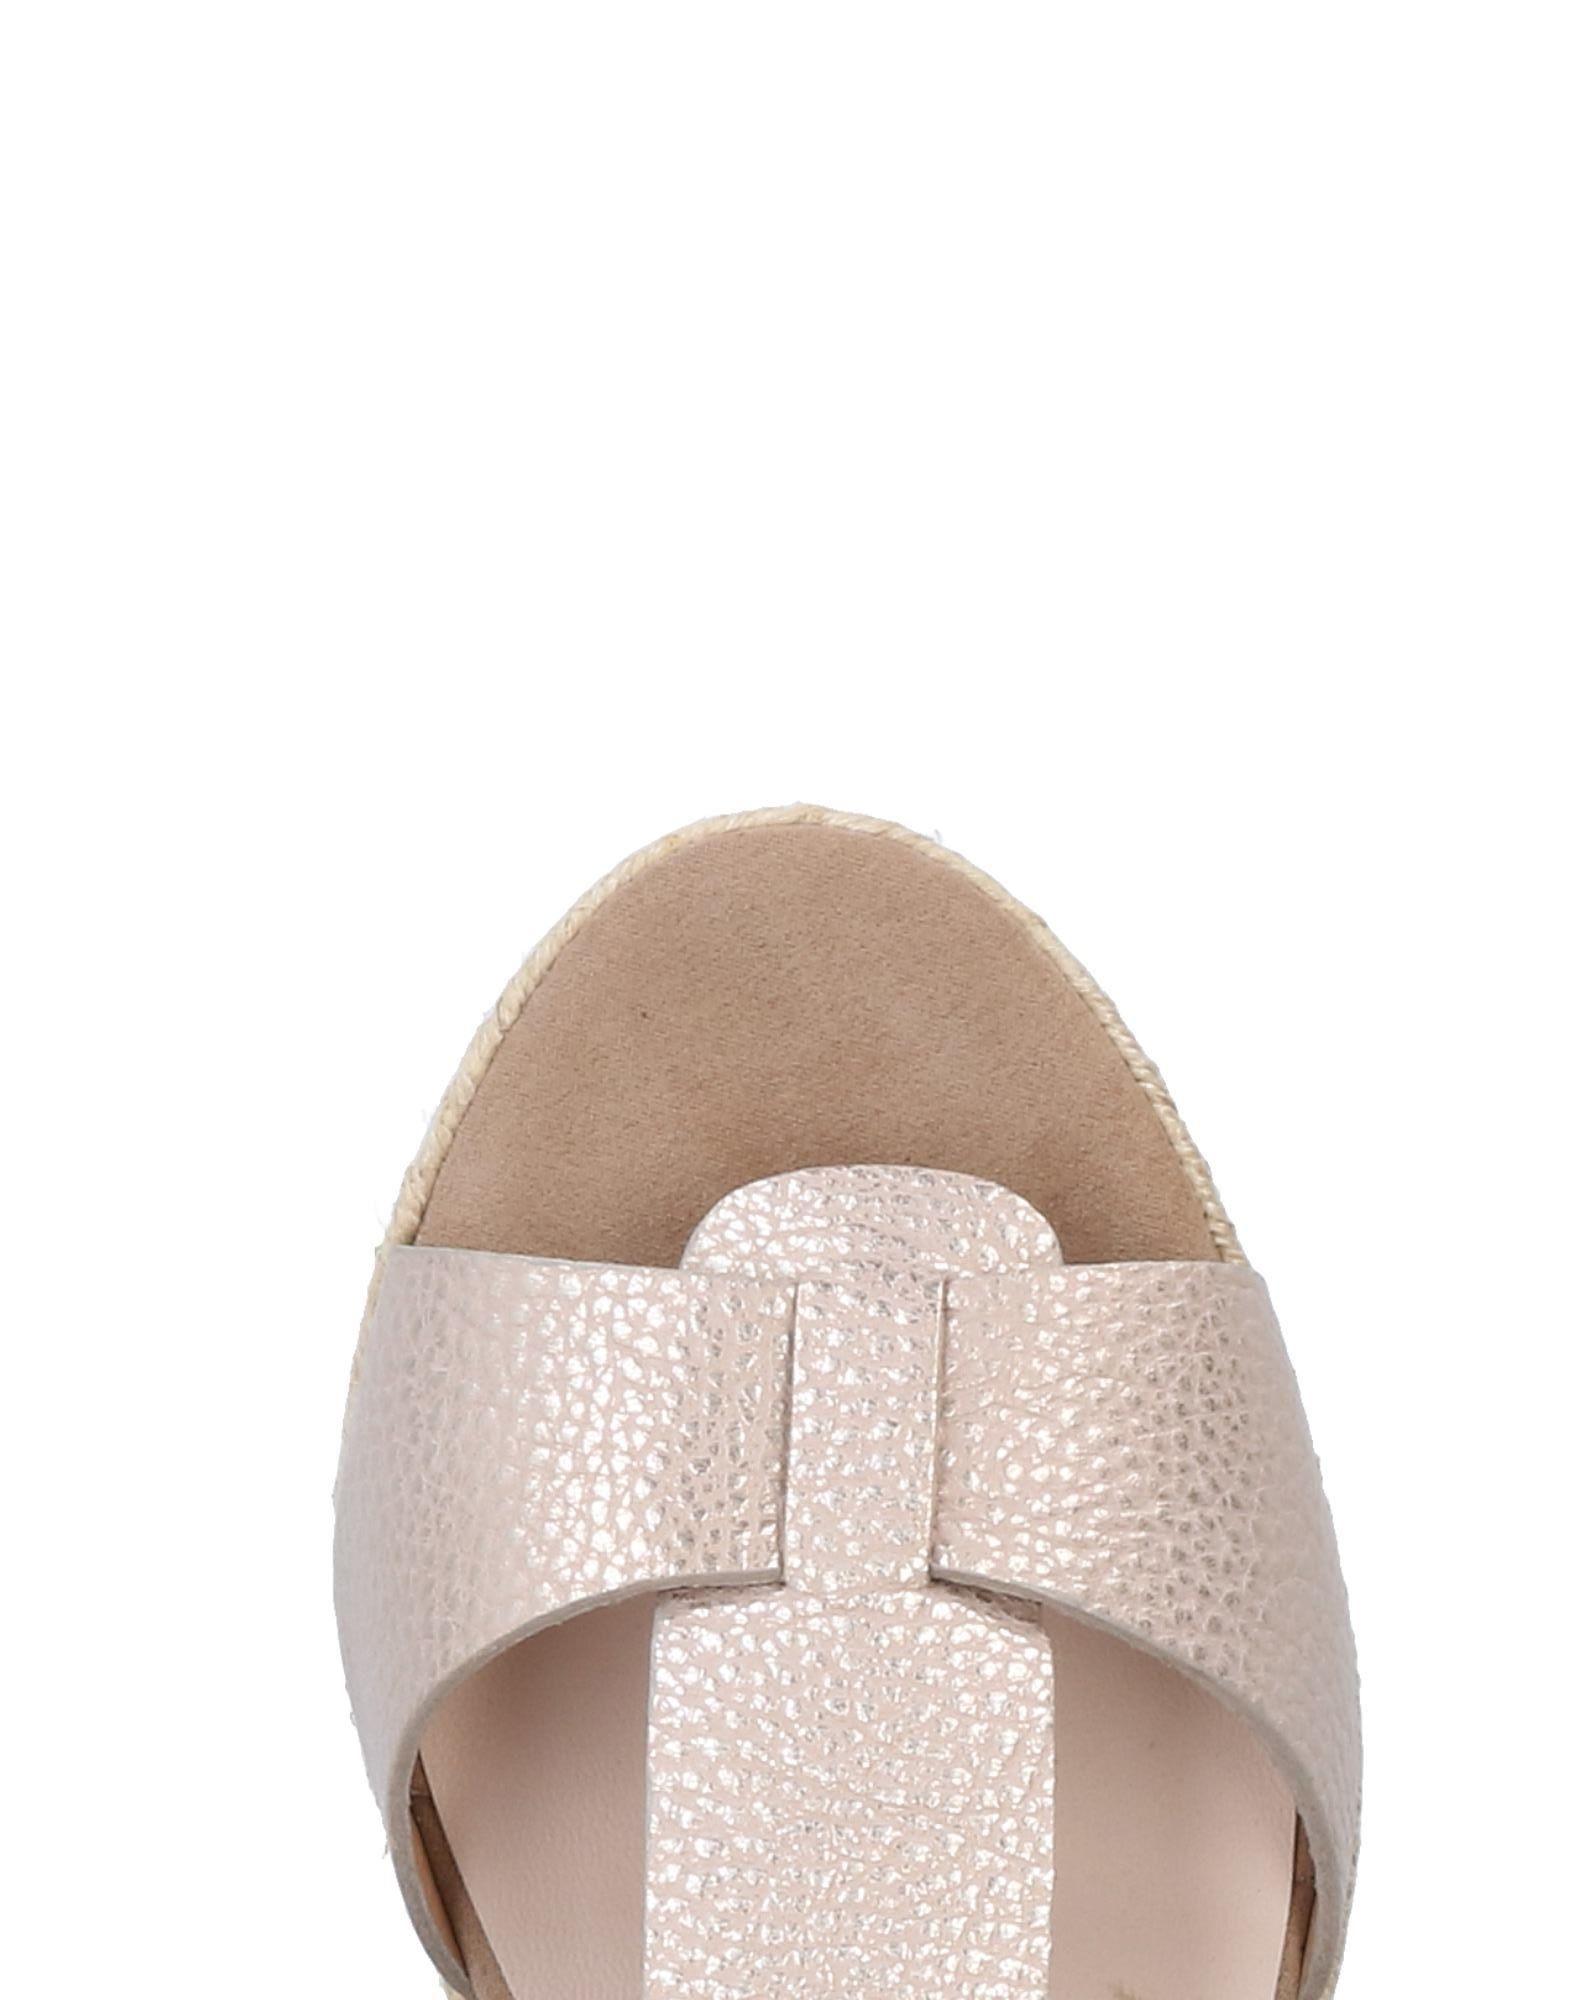 Soher Sandalen Damen Damen Sandalen  11460772GI Gute Qualität beliebte Schuhe 83ab36